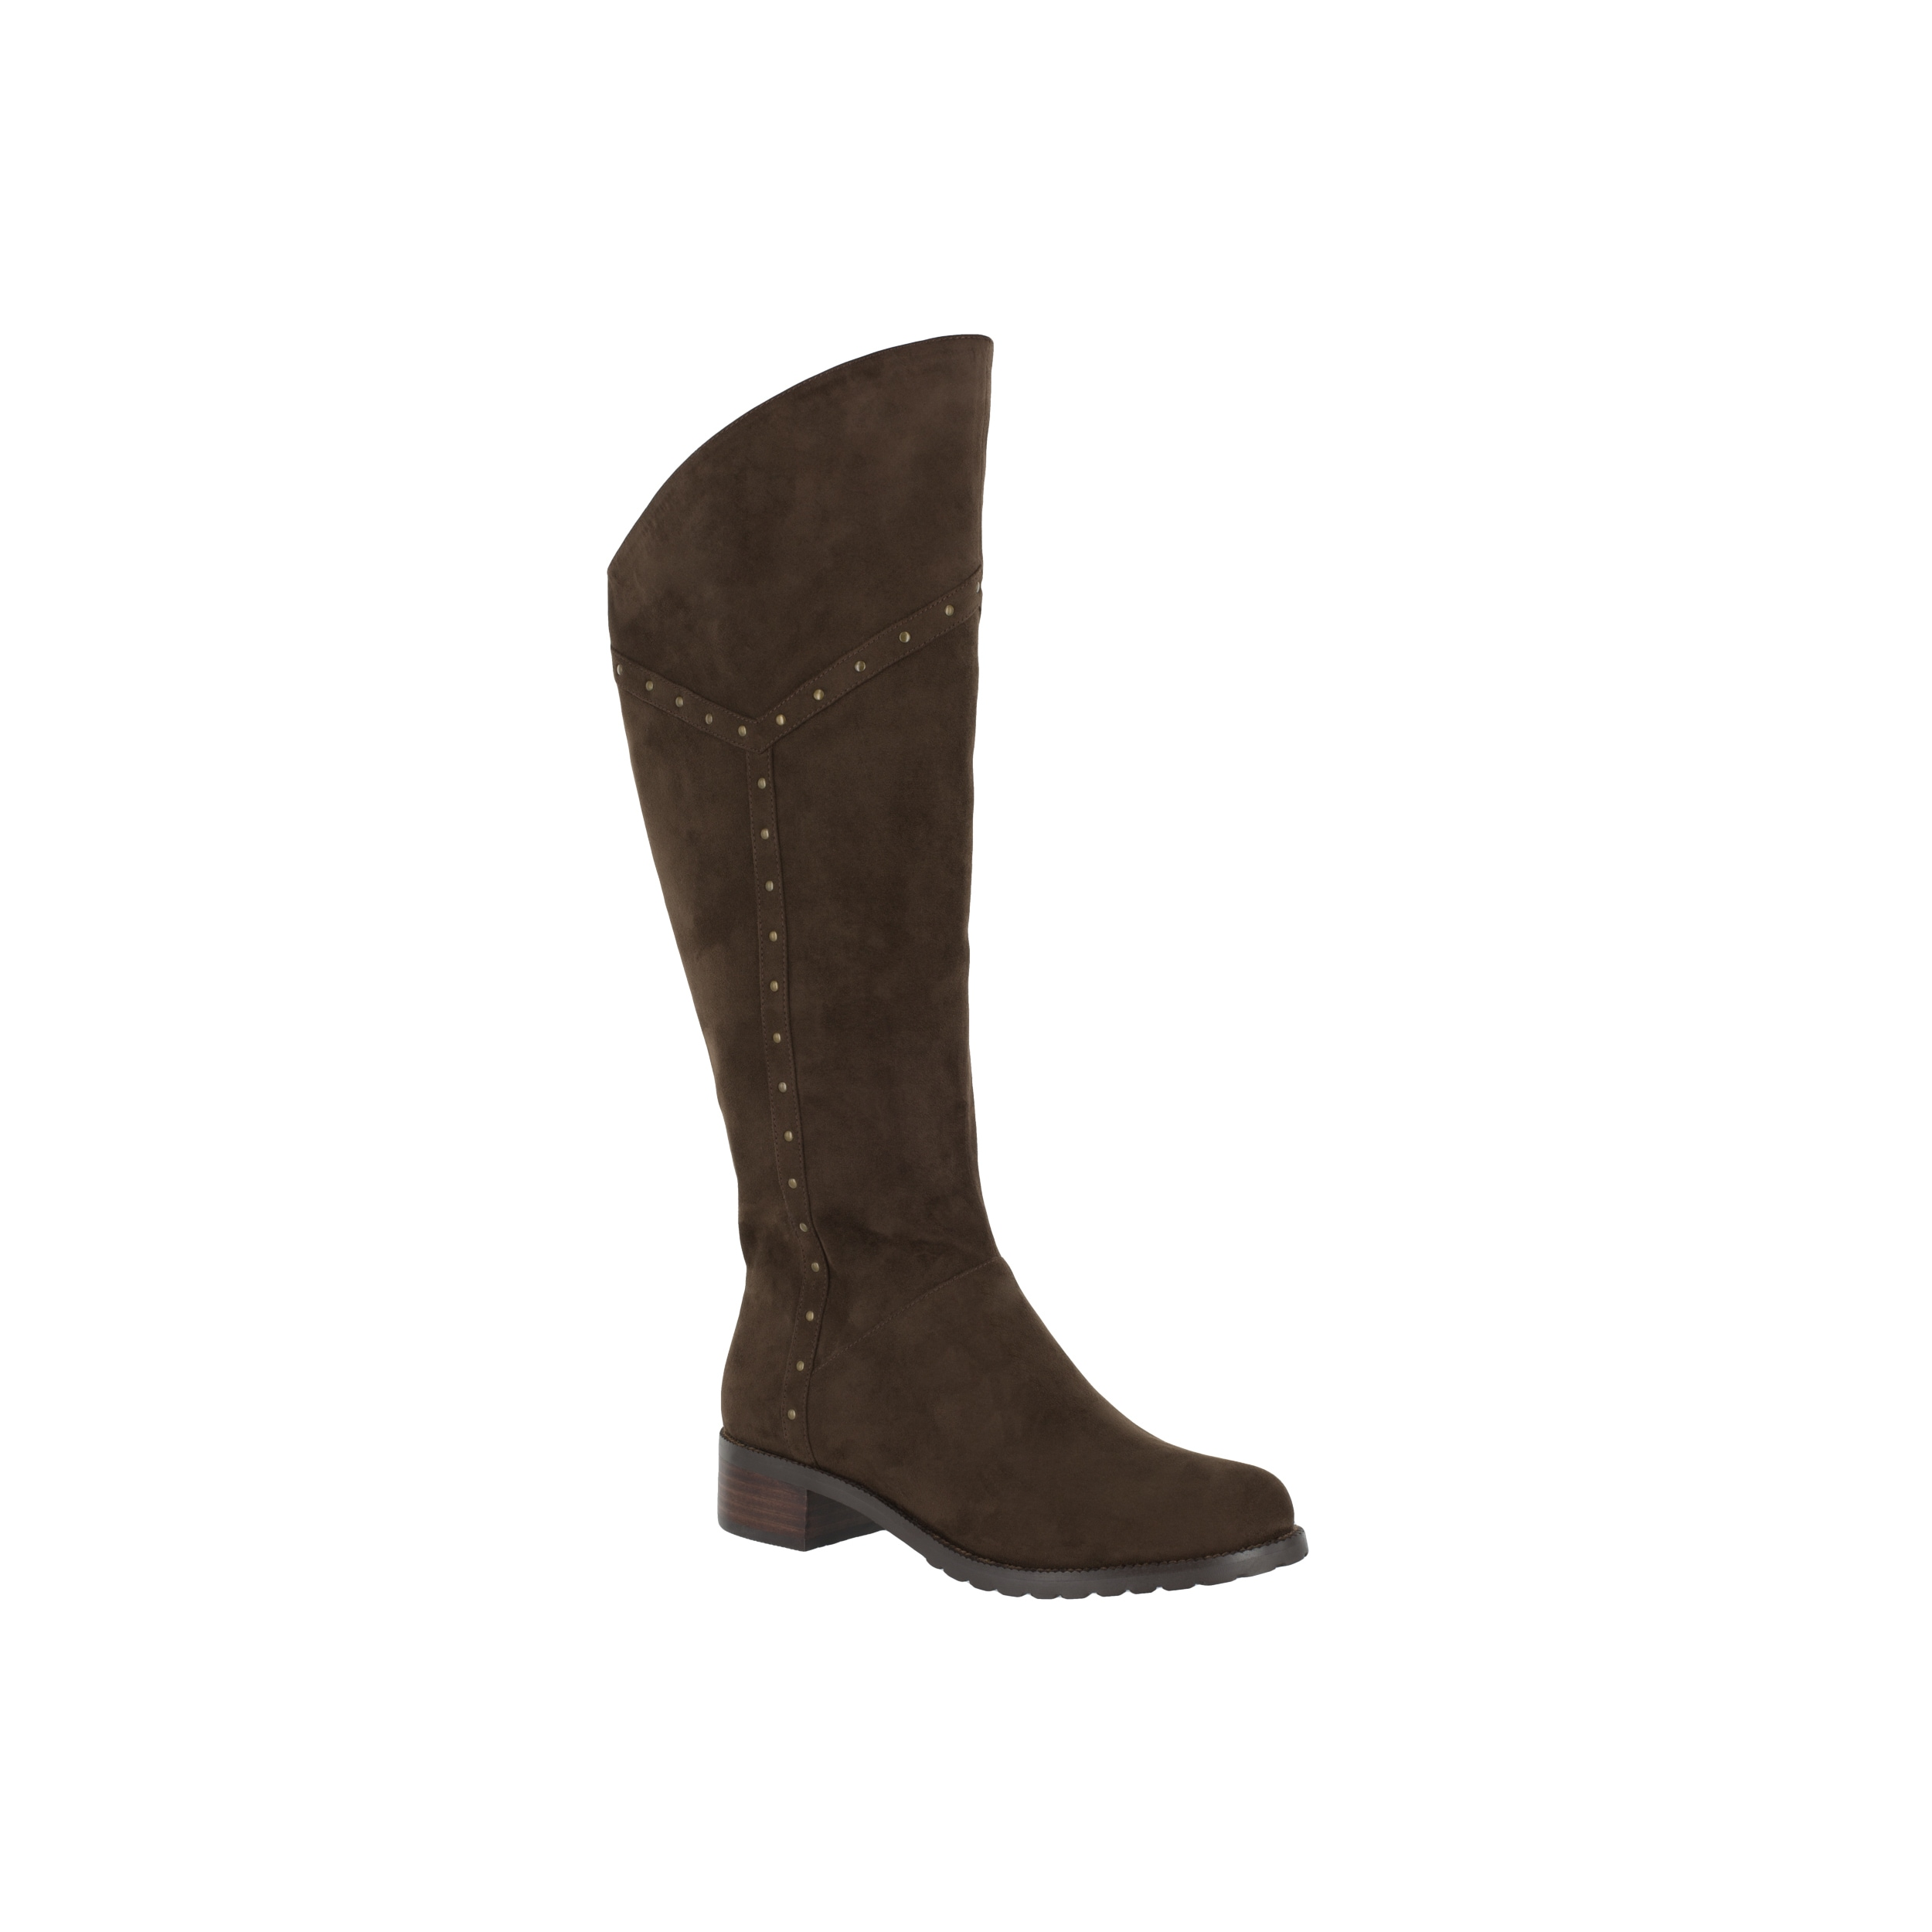 Bella Vita Women's Alanis II Brown Super Suede Tall Boots by Overstock